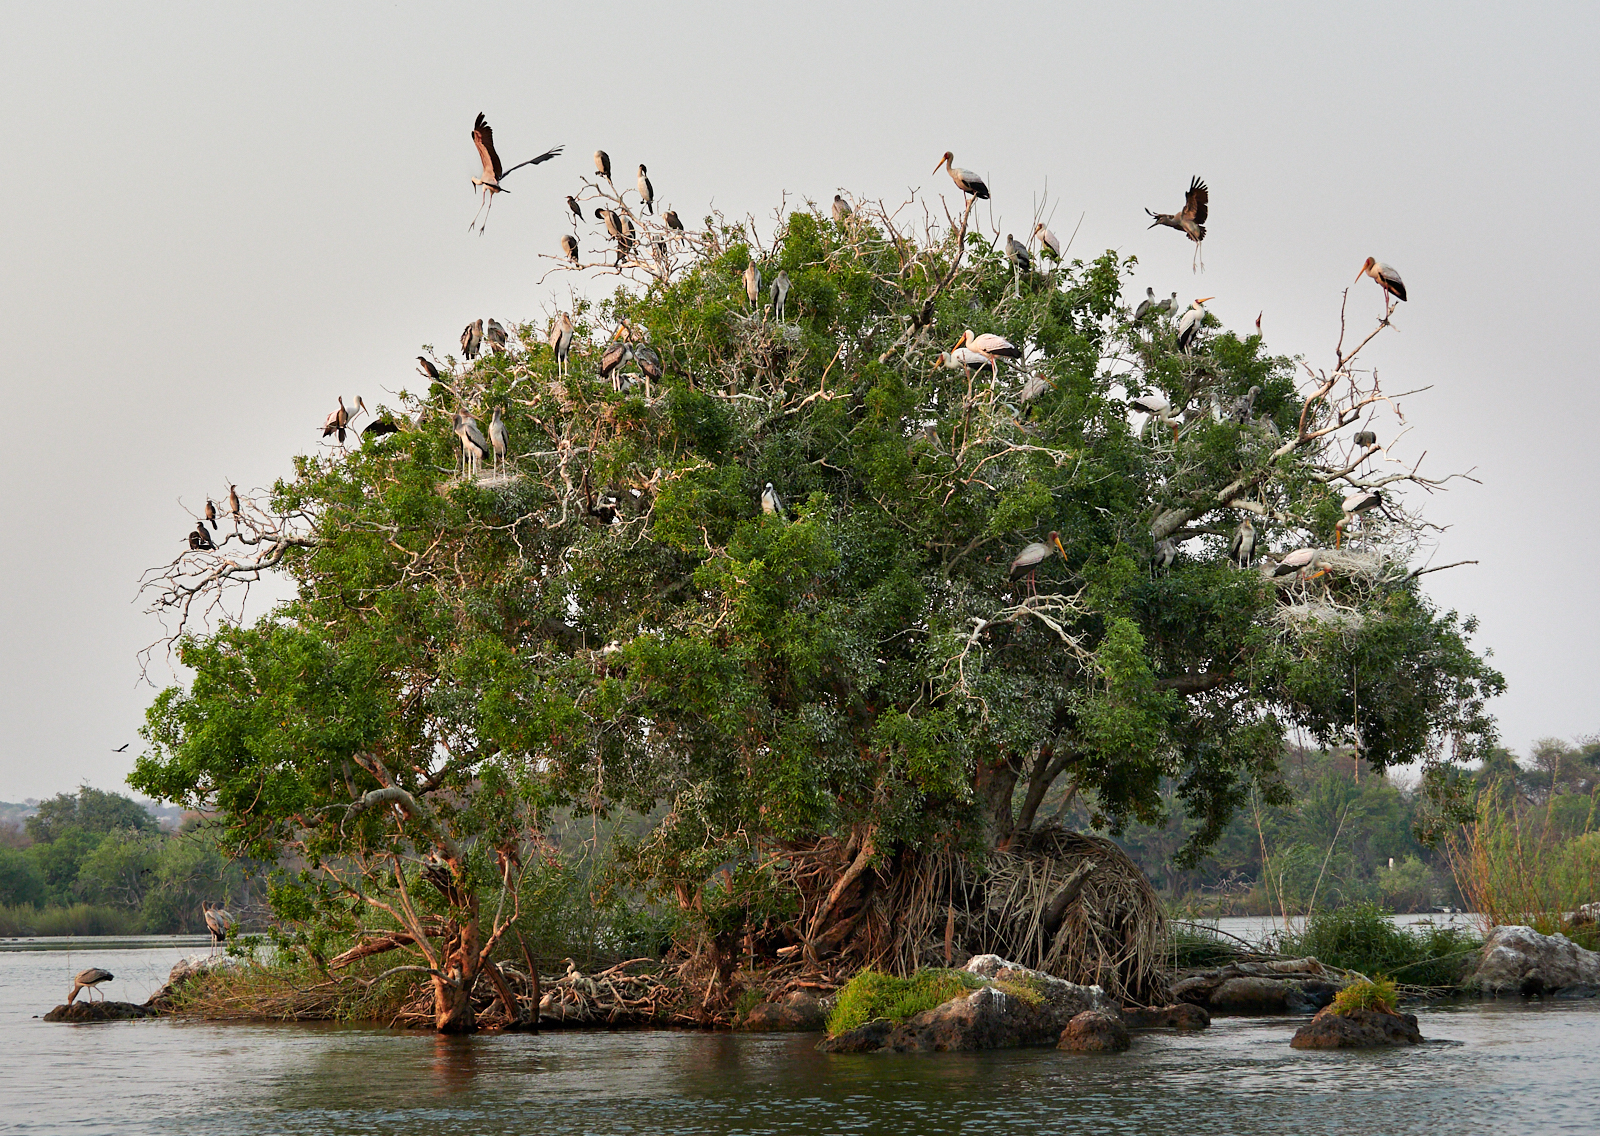 Nesting tree 1600x1200 sRGB.jpg